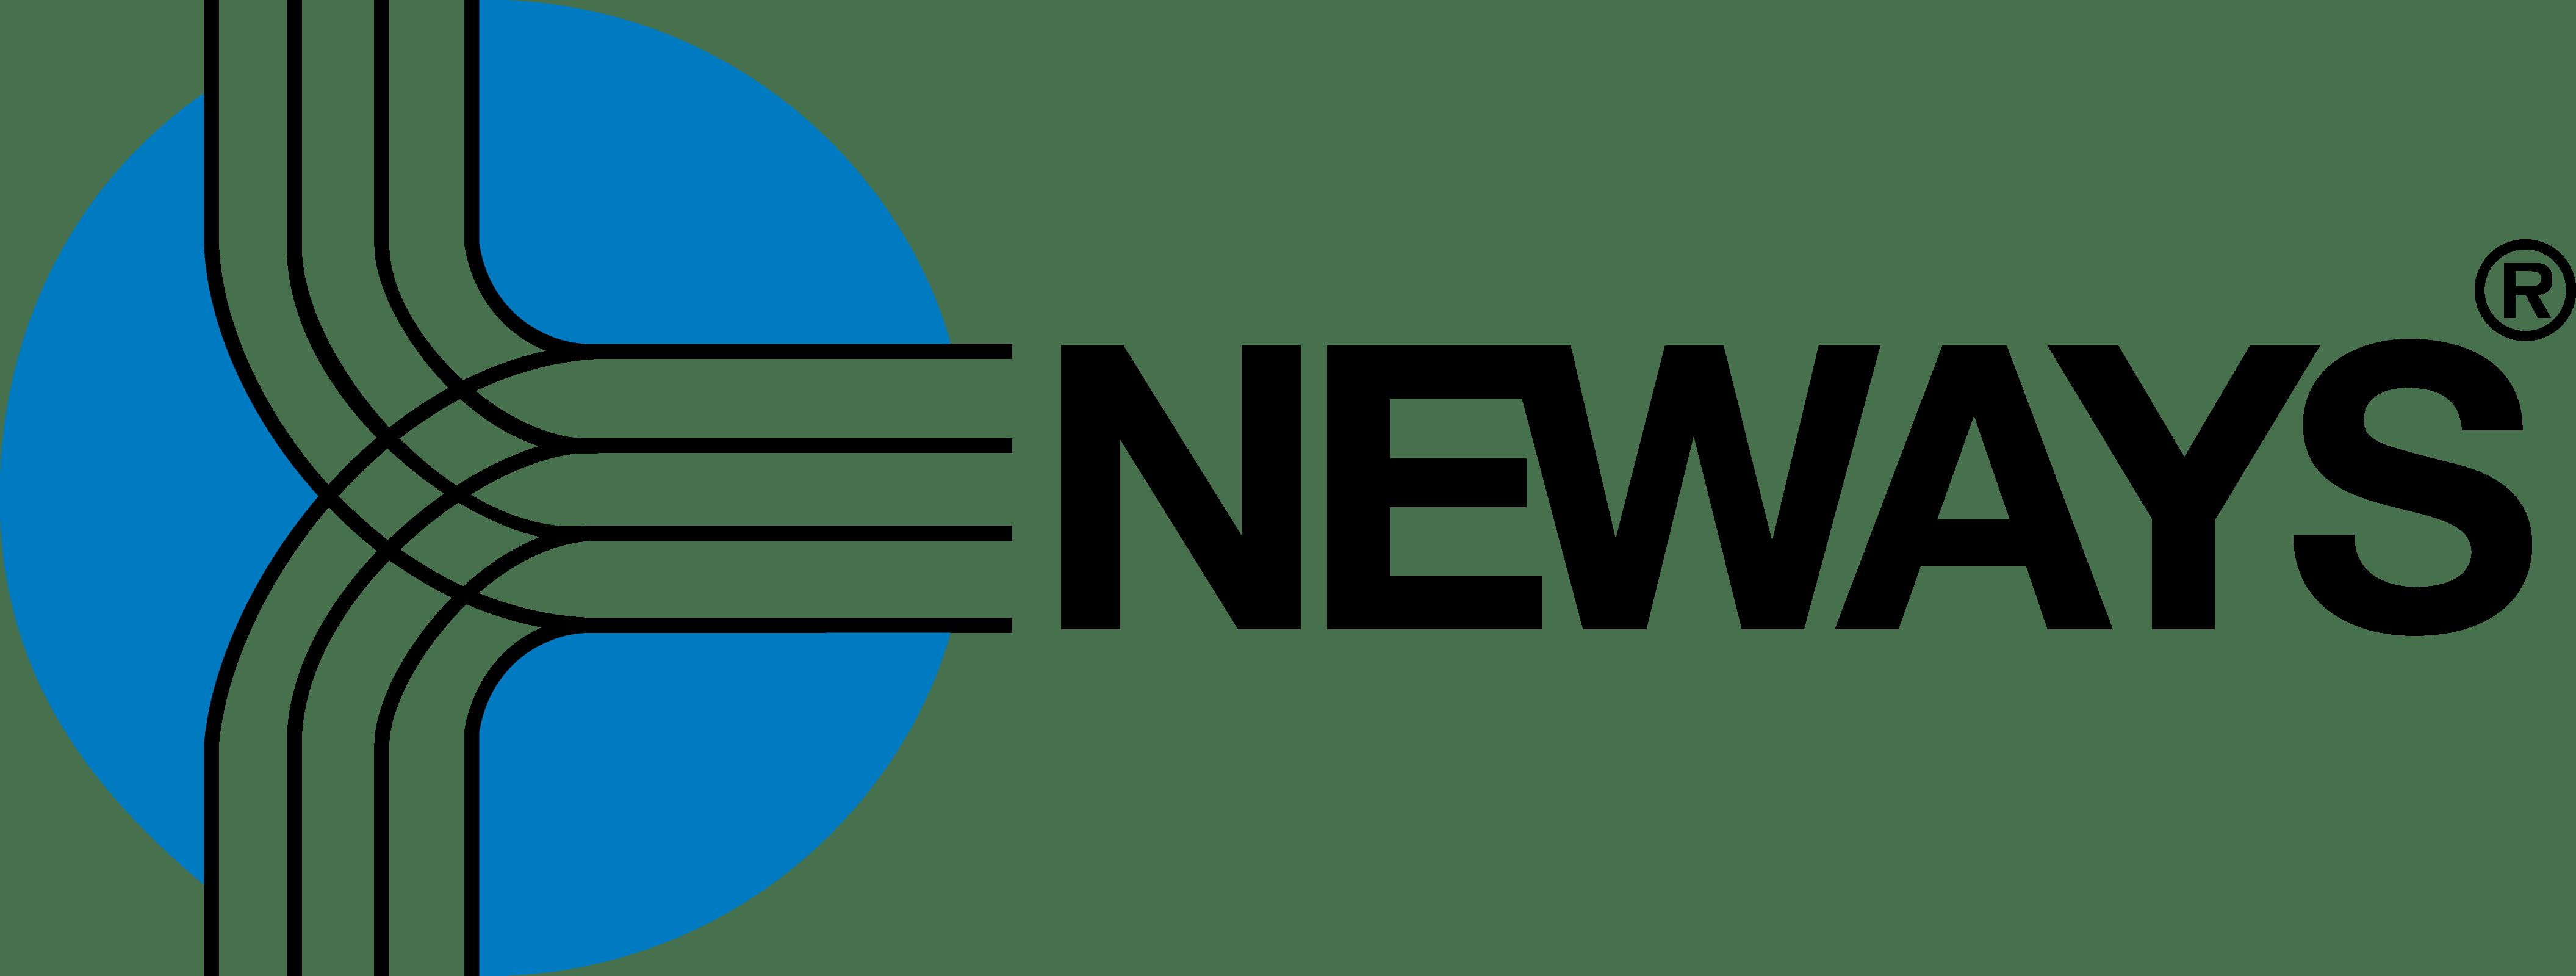 Neways Electronics International